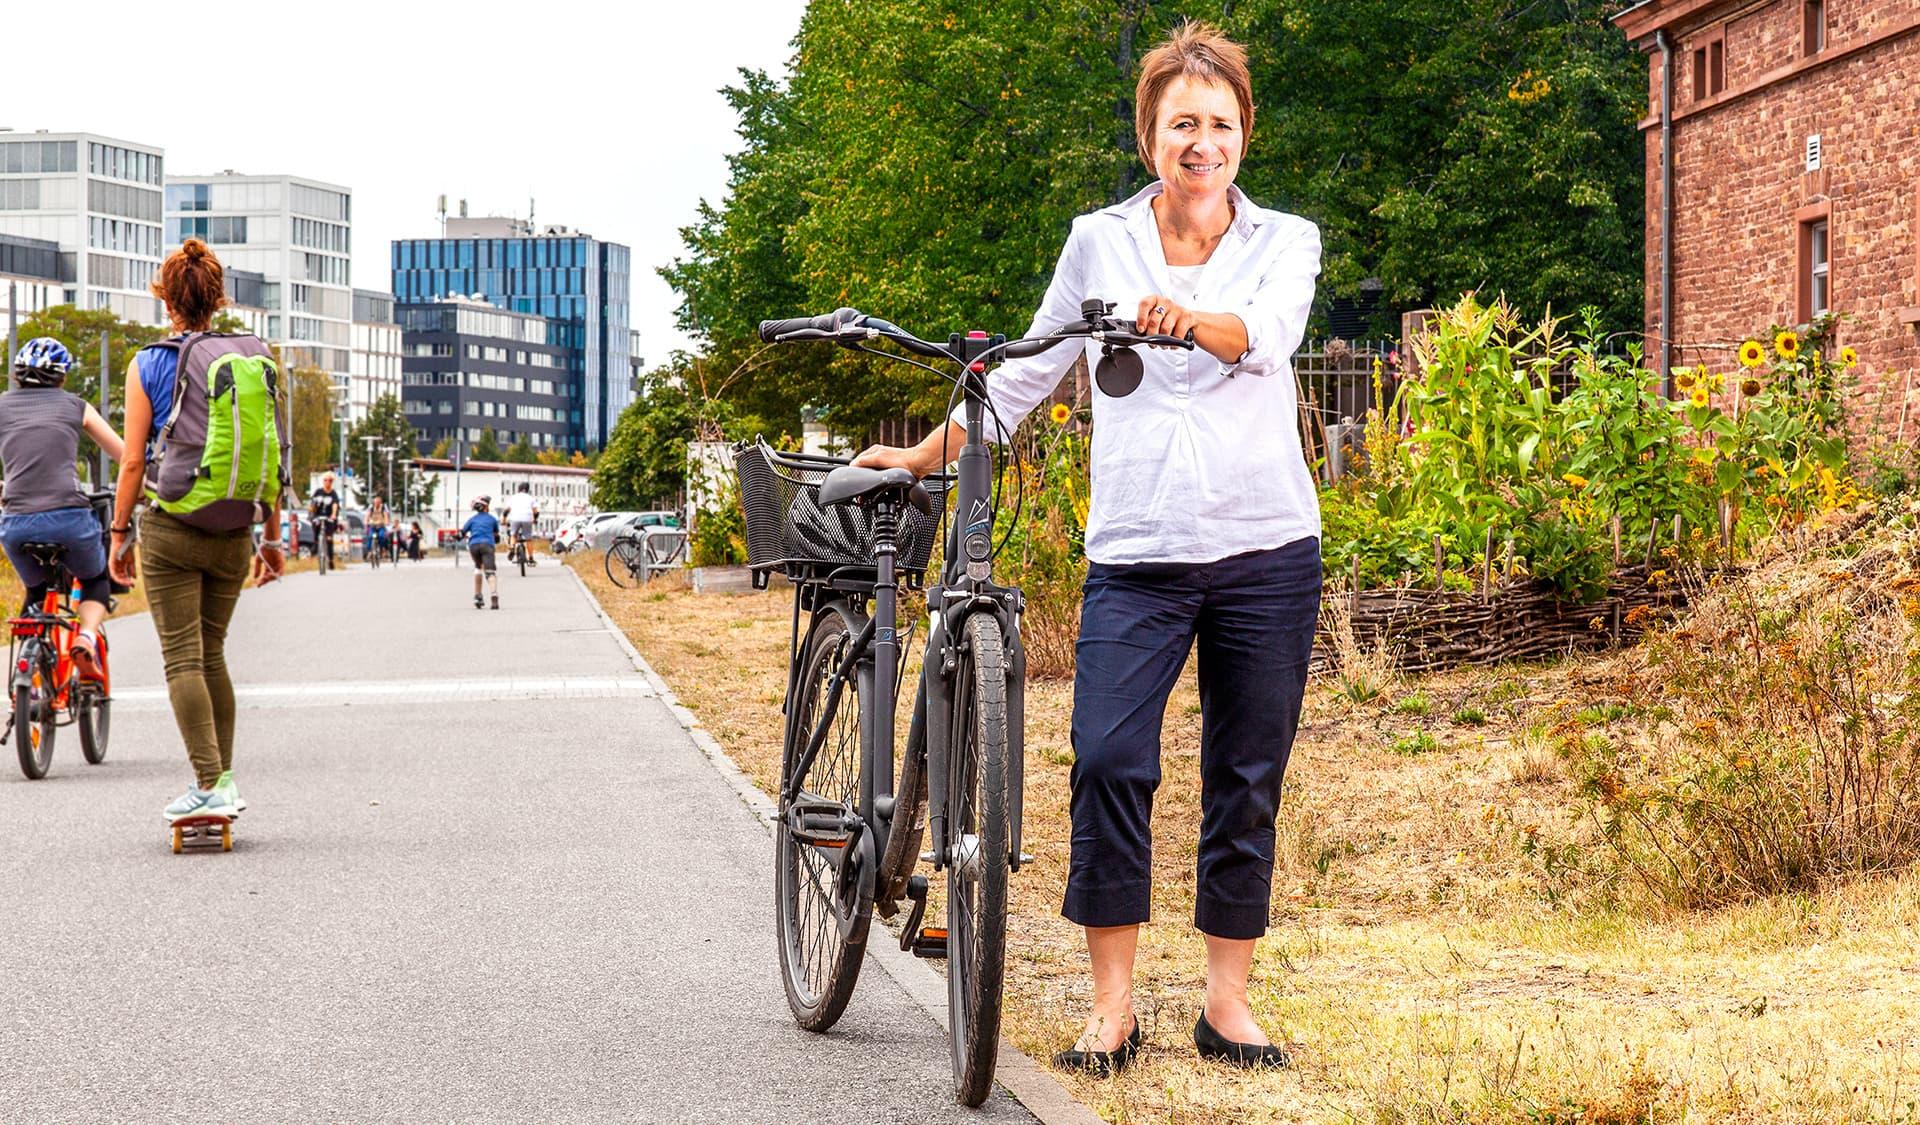 Bettina Lisbach Bürgermeisterin der Bio-Stadt Karlsruhe